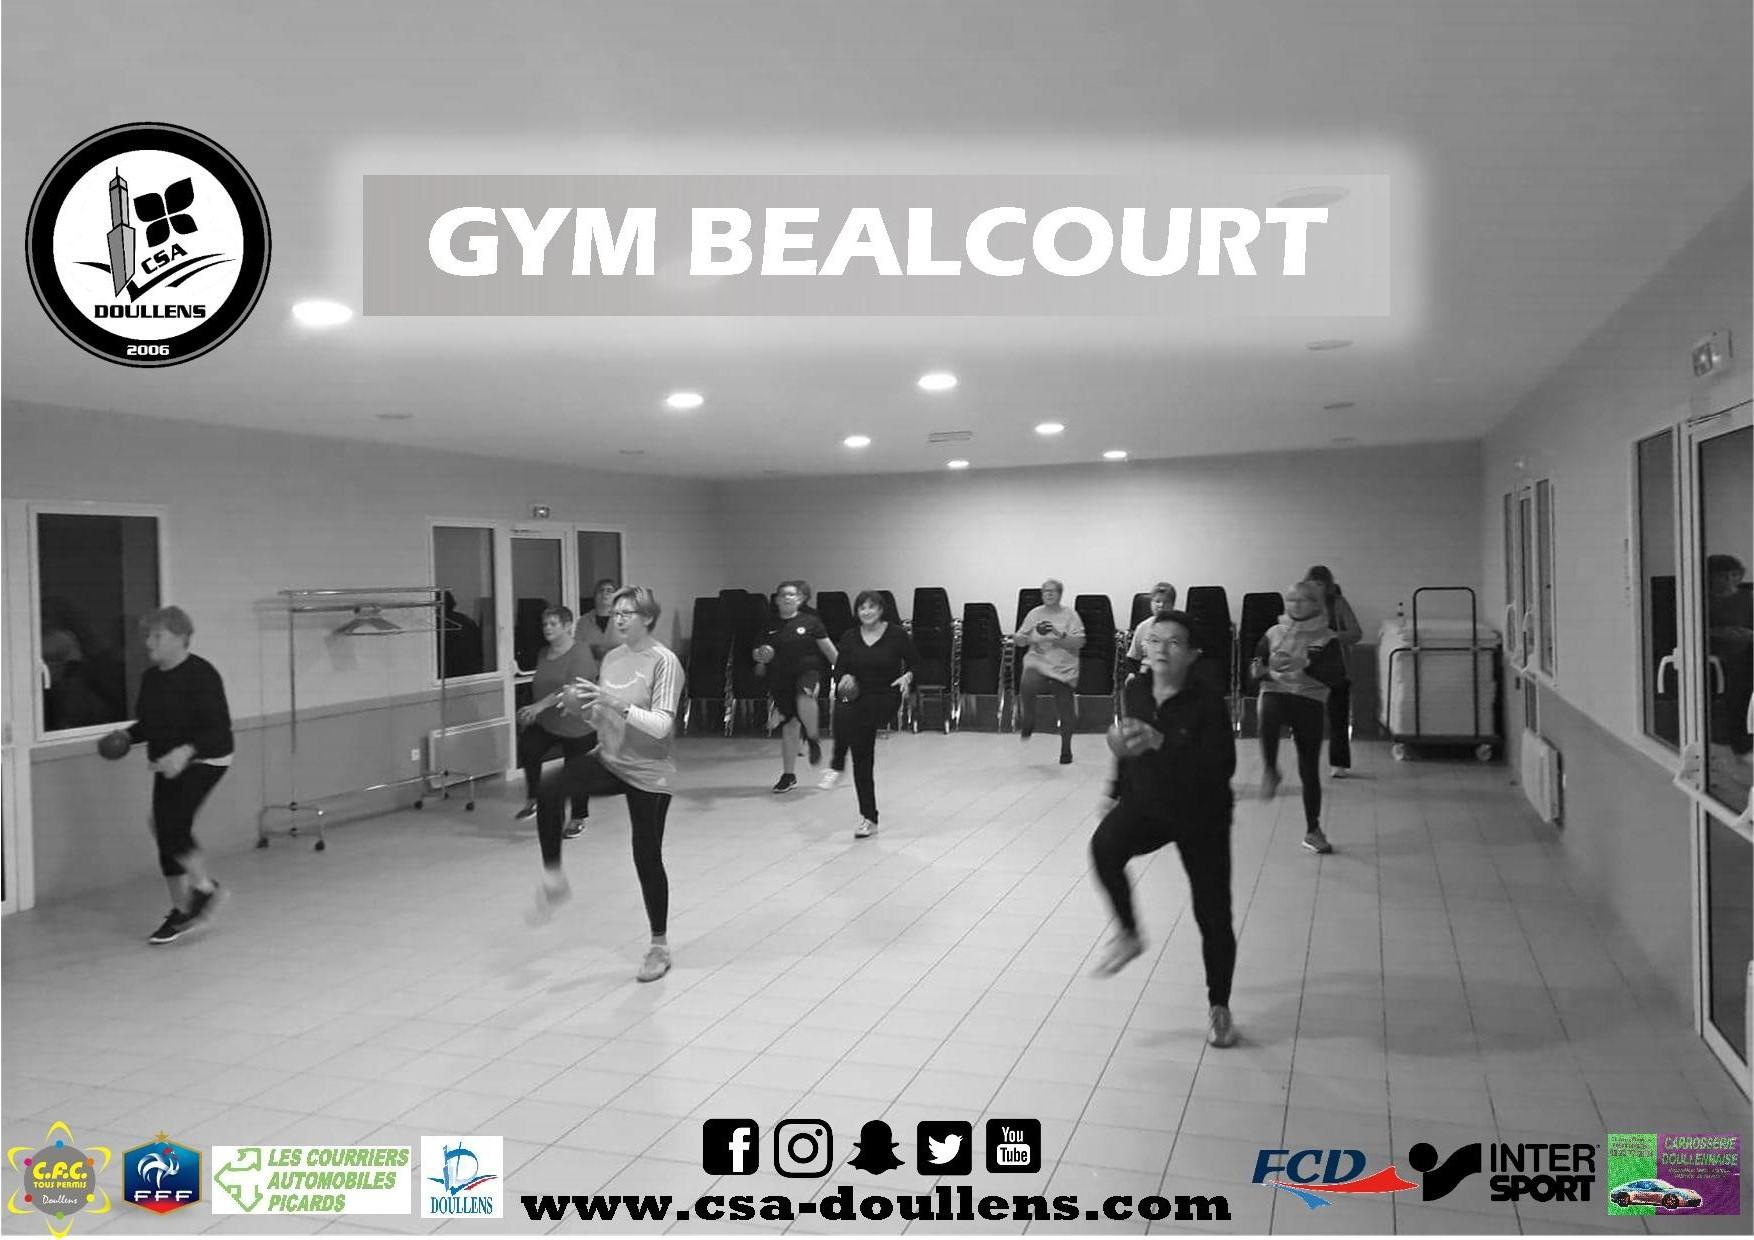 Gym bealcourt